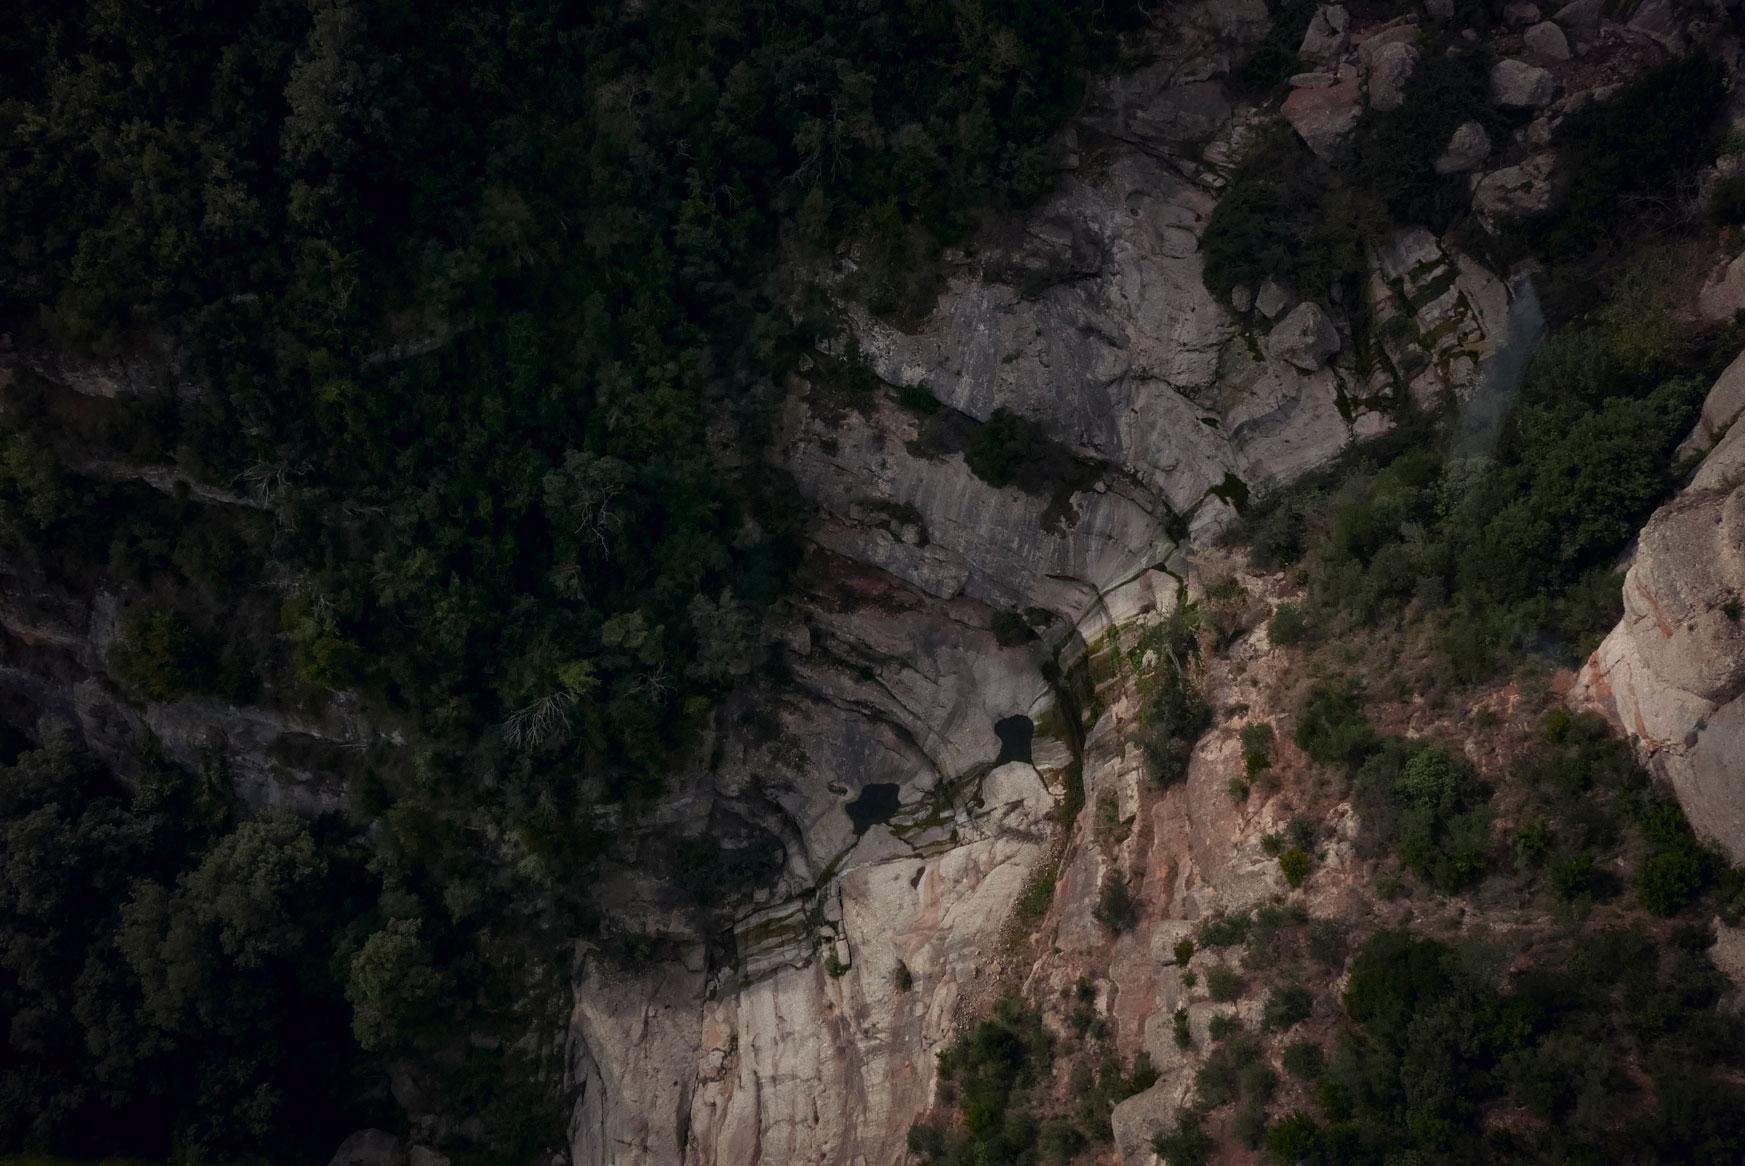 Spain Barcelona Montserrat Monastery cableway rocks